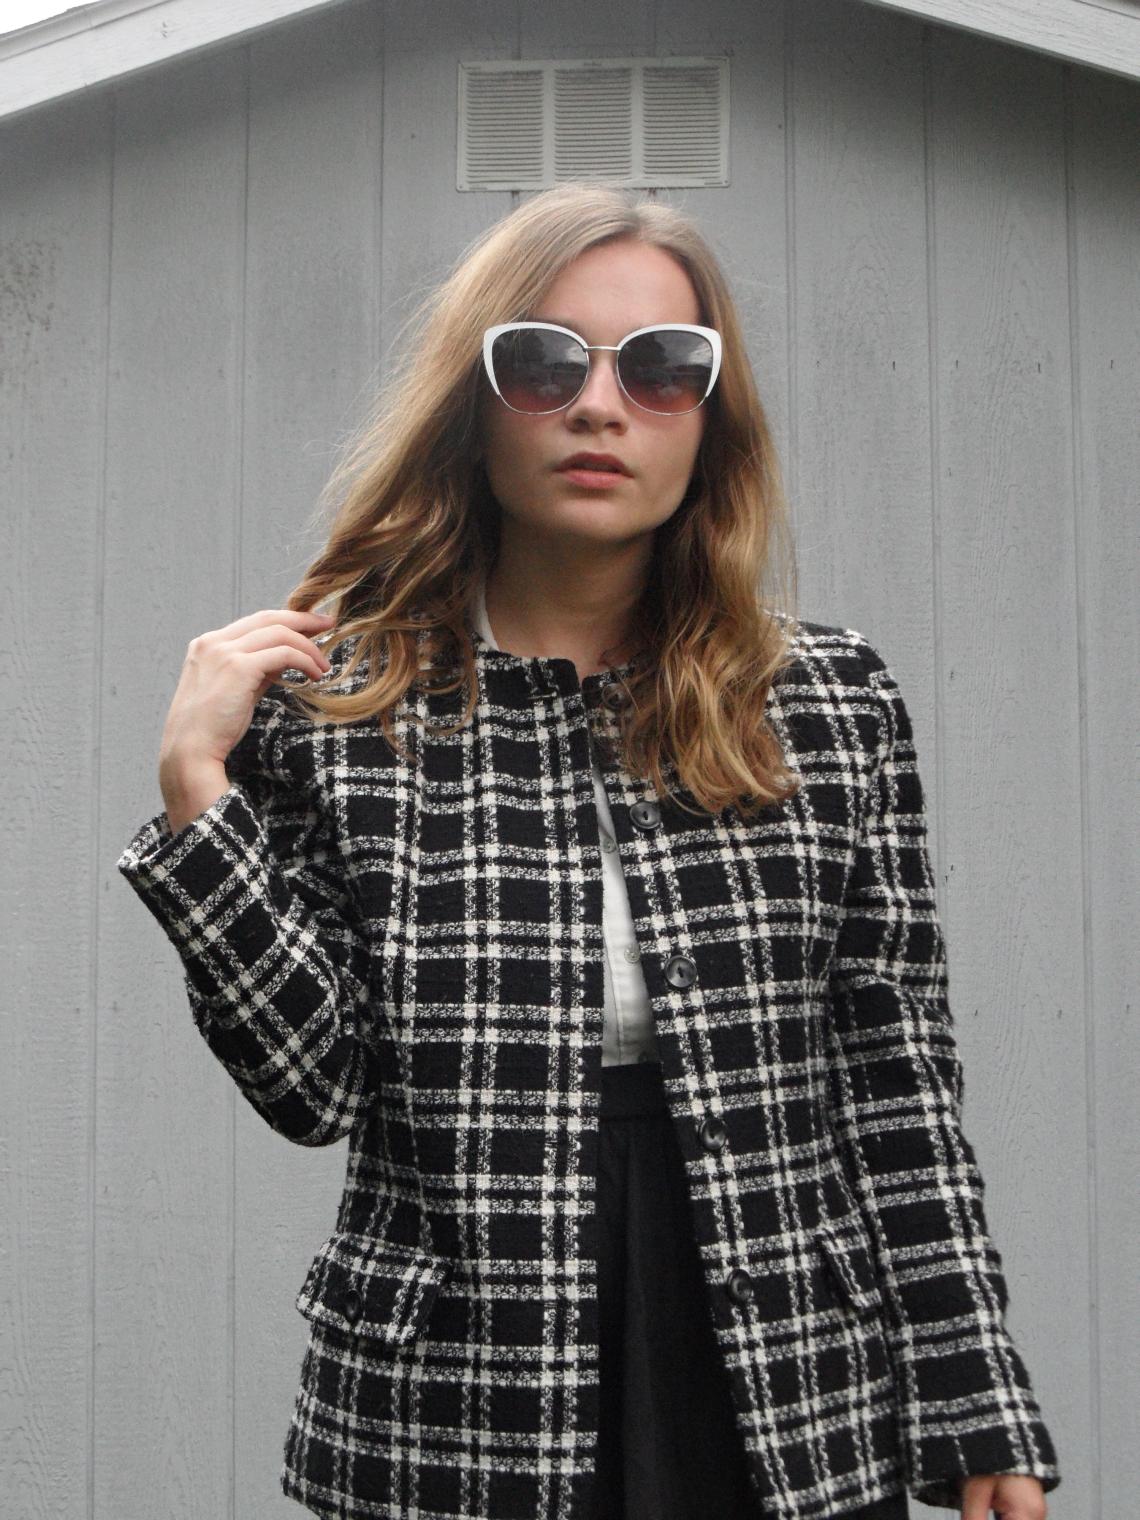 fashion blogger twisting piece of hair